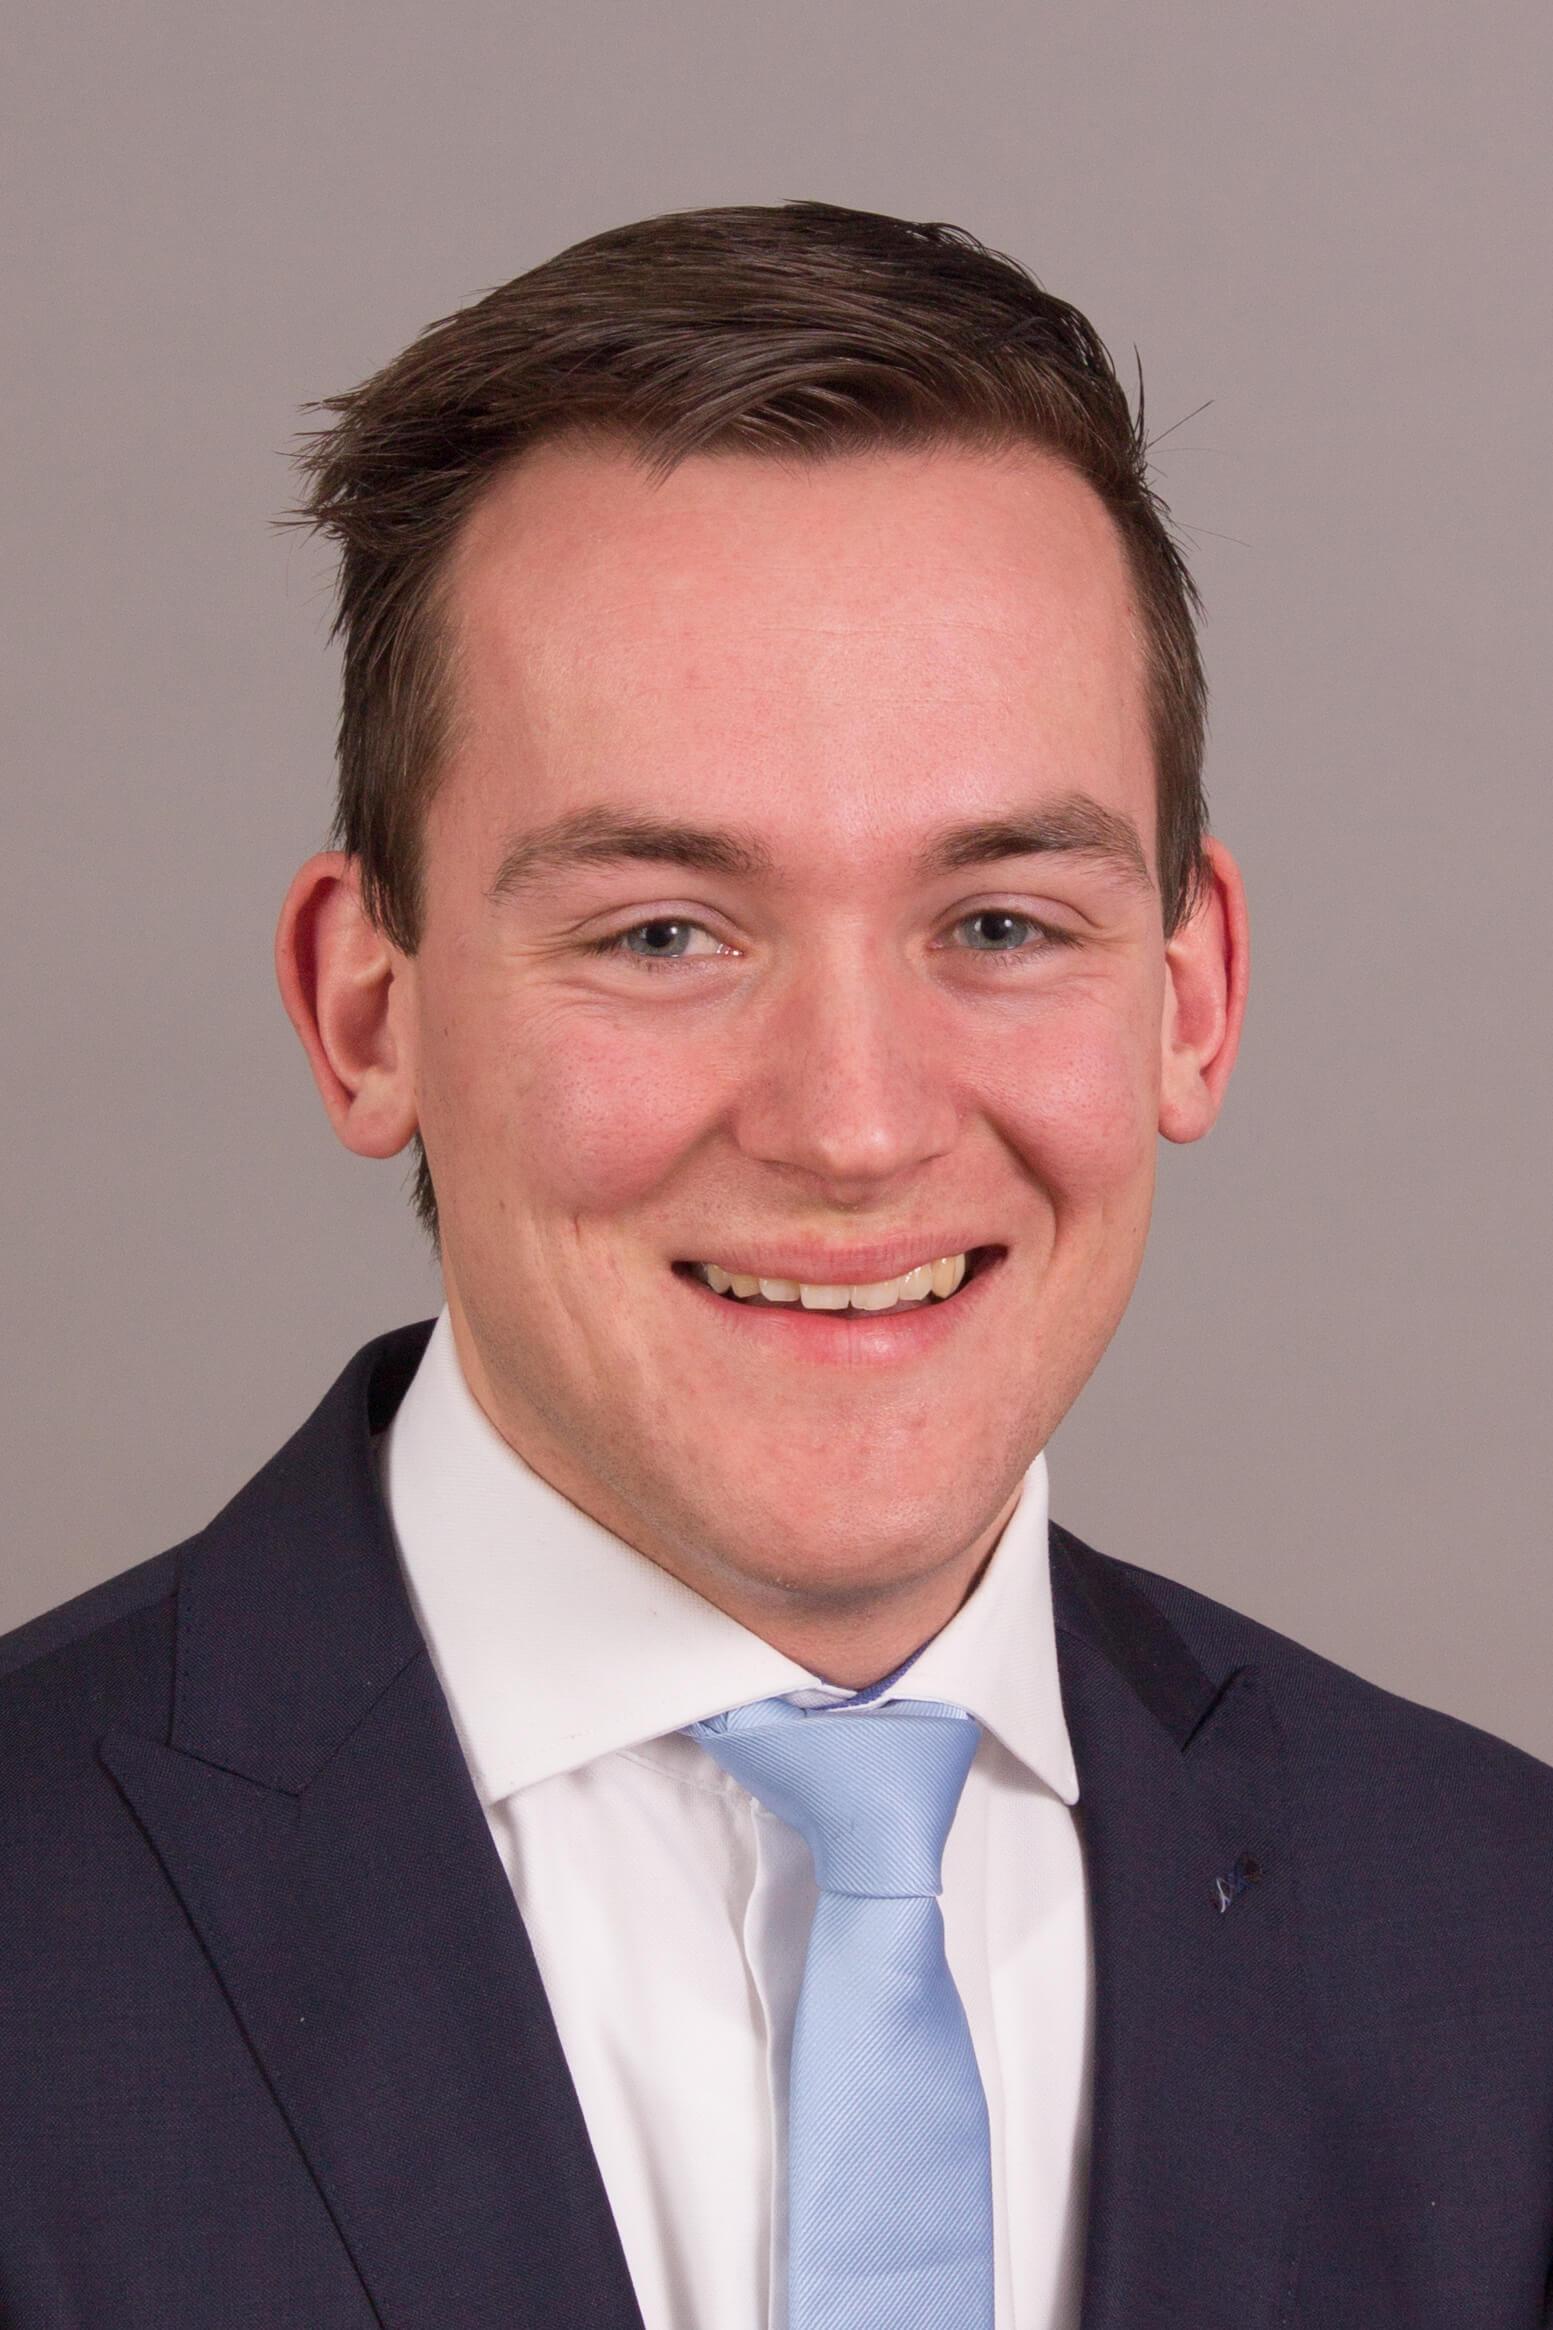 Daniel Wassink - Langerak de Jong